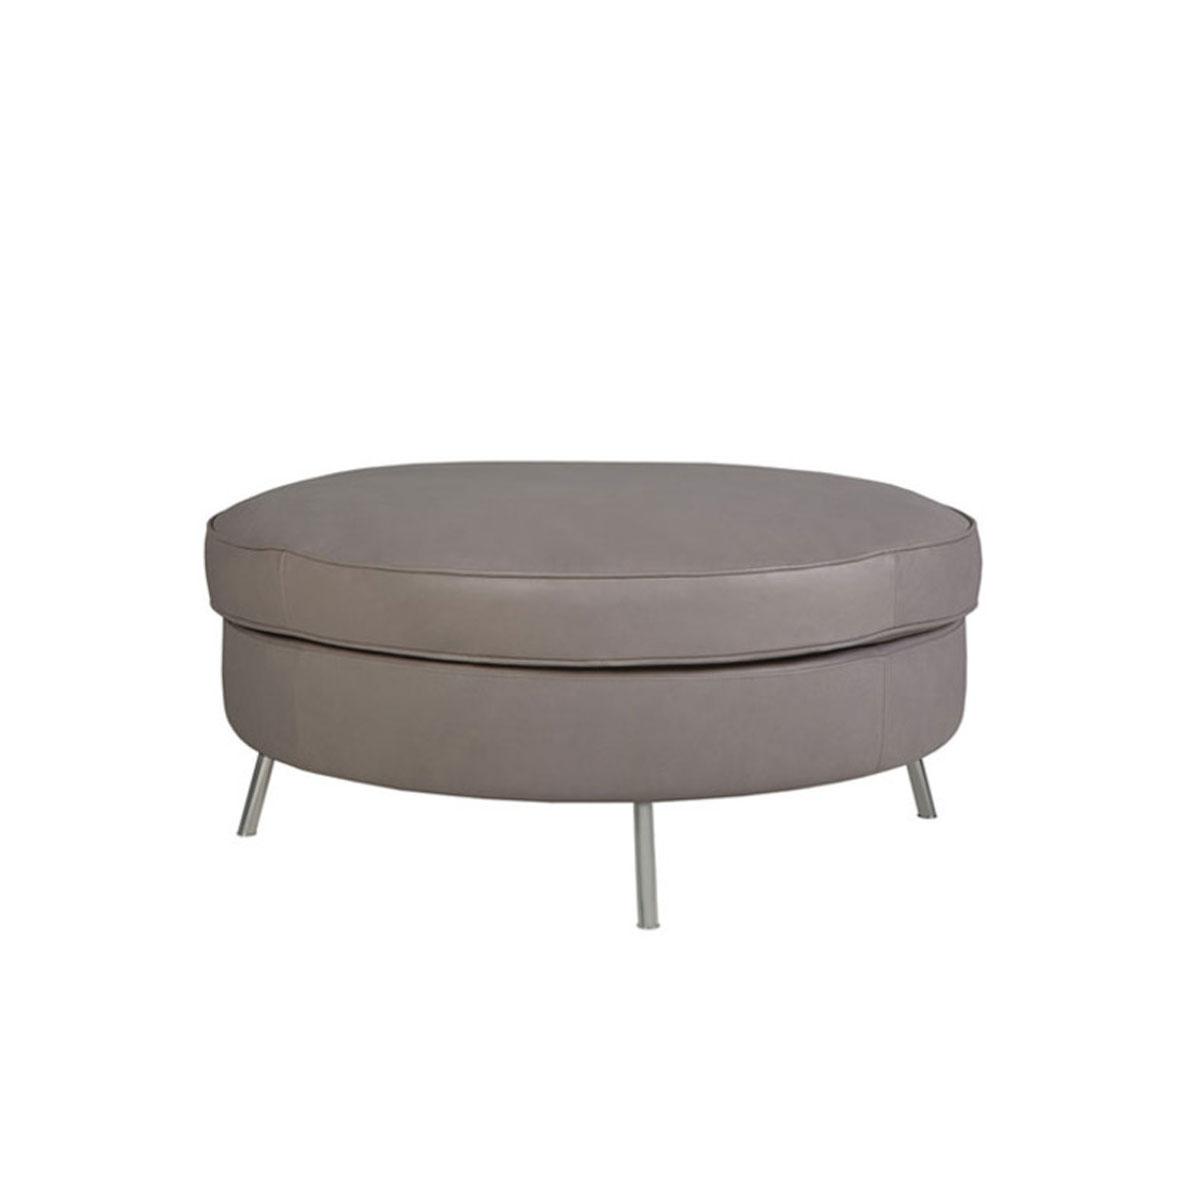 Jules footstool round